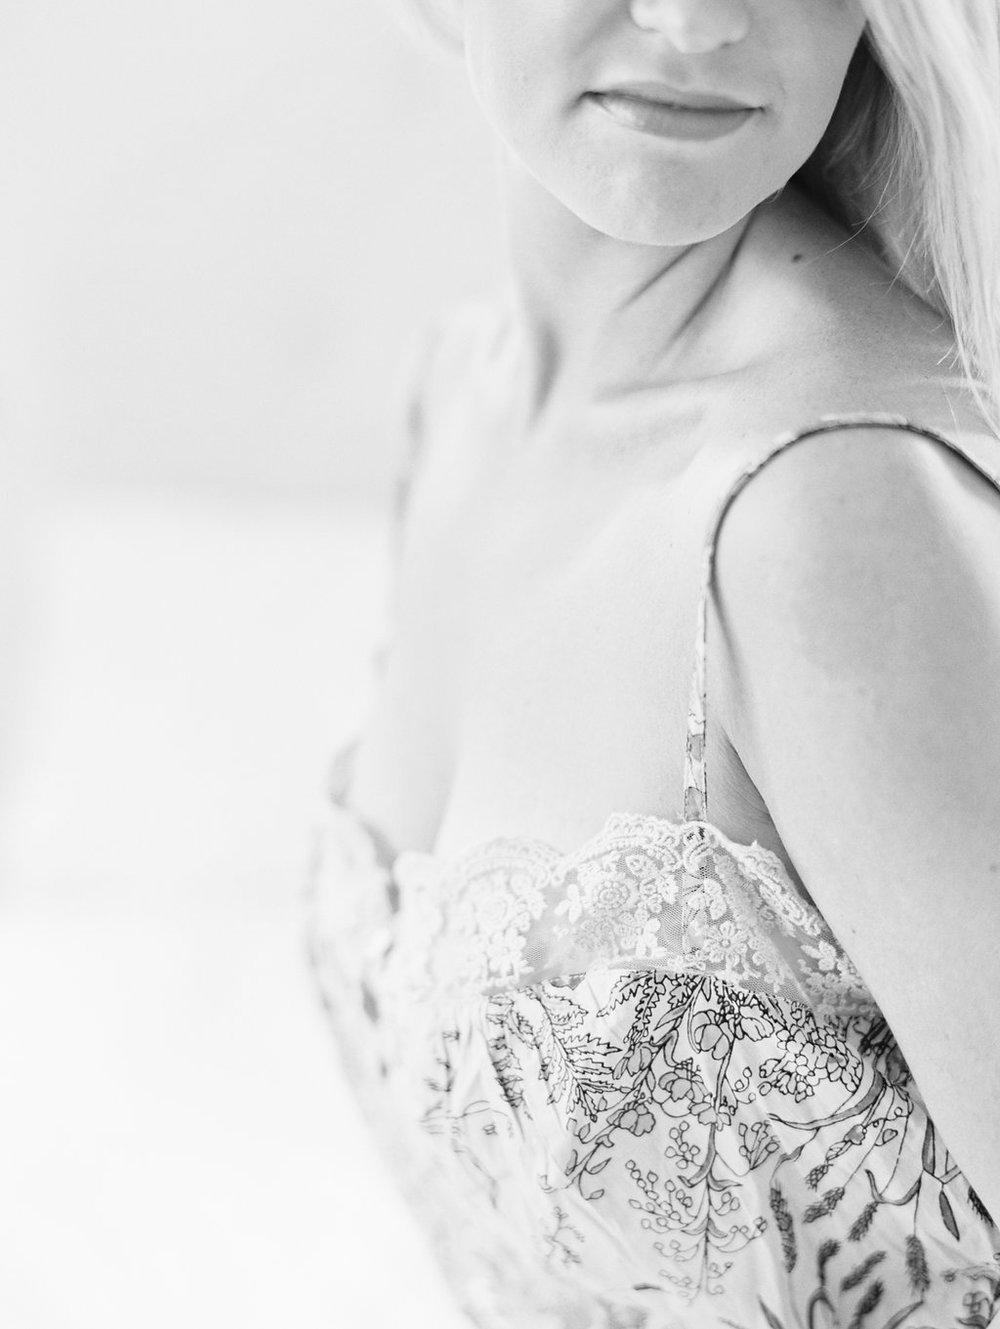 Michelle-March-Photography-IM-B-31.jpg